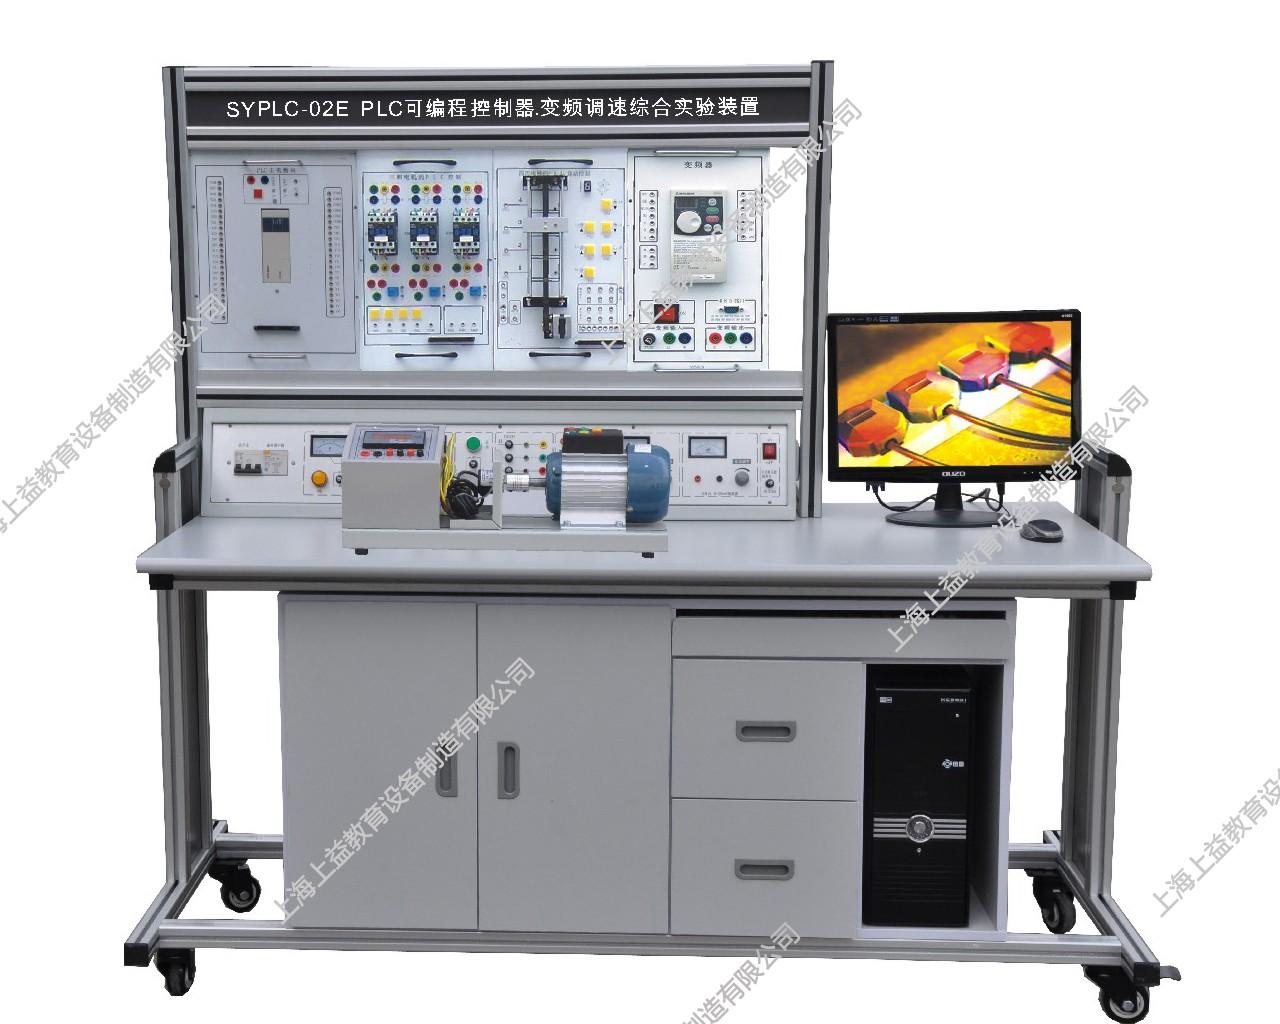 SYPLX-02CPLC可编程控制器、变频调速综合wwwlehu8vip装置